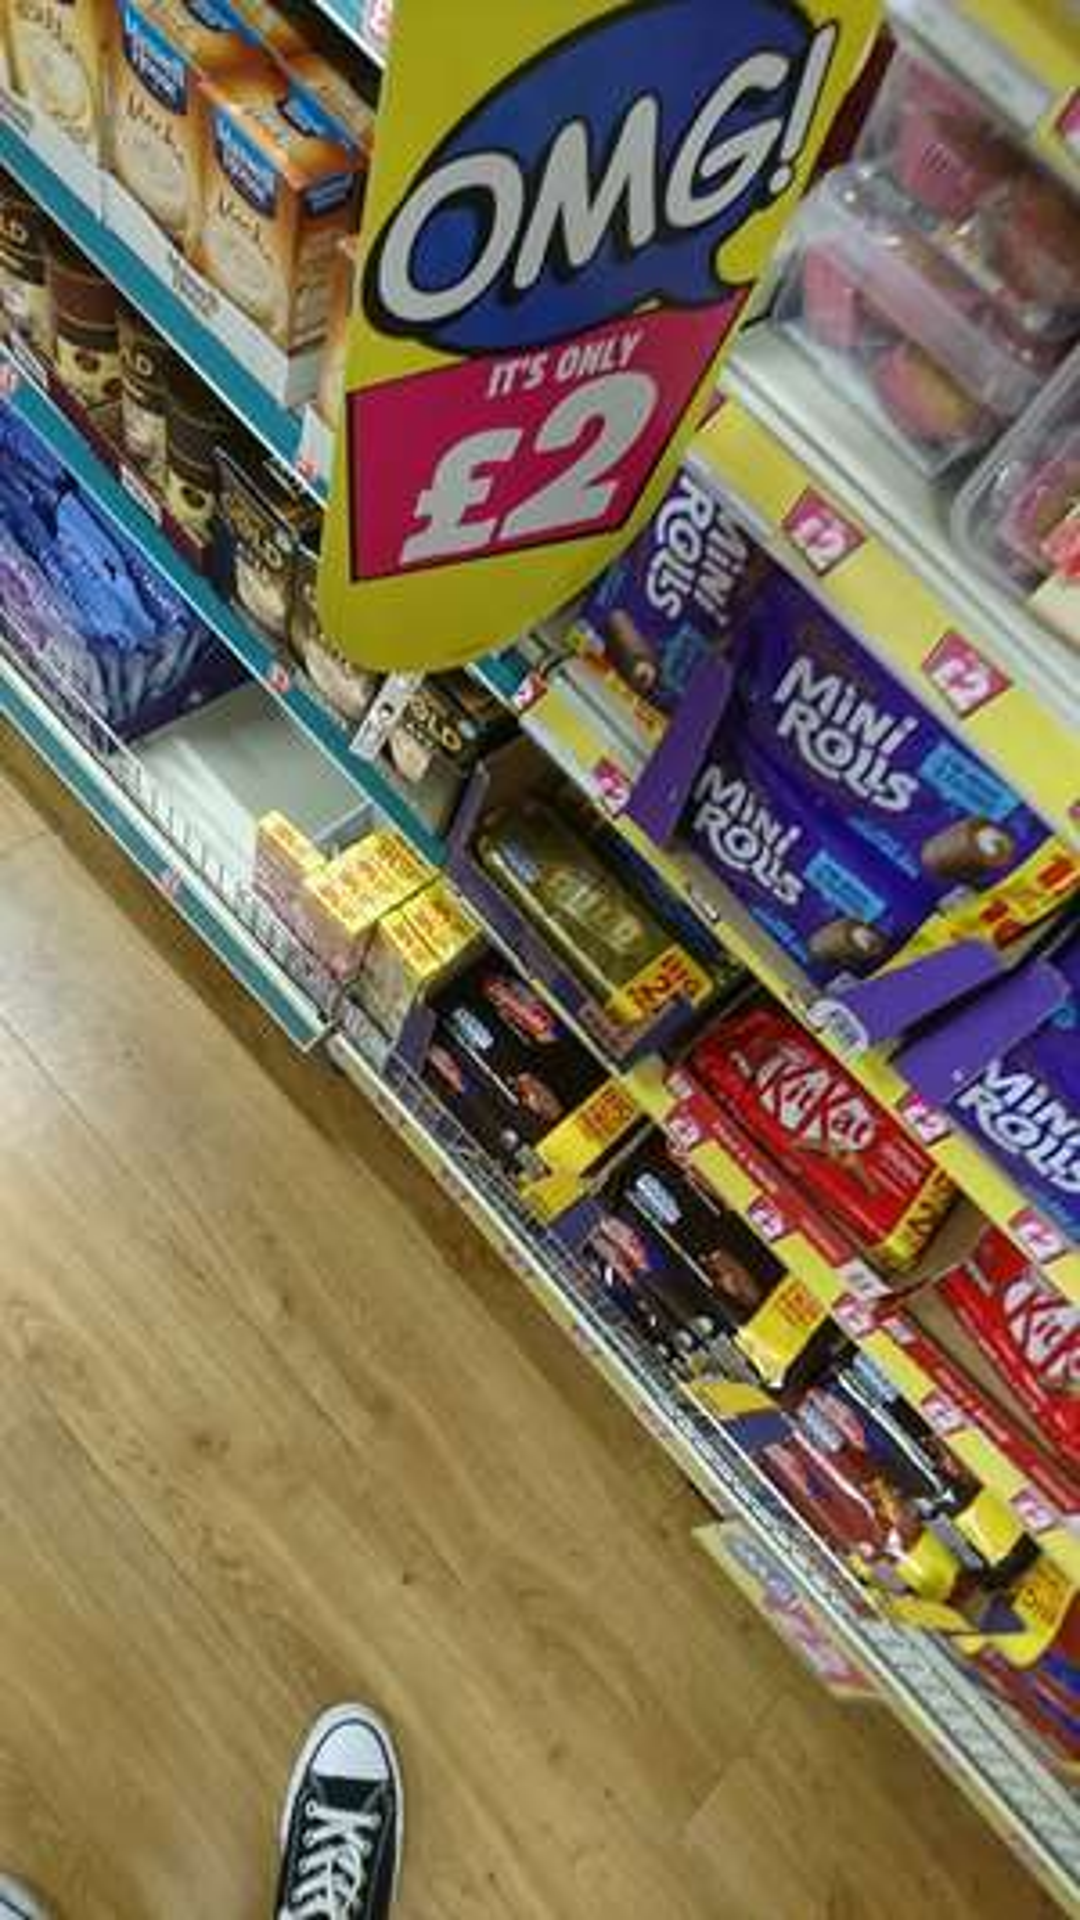 21 gold bars for £2 at Poundland and Asda.. And Home bargains and B&M